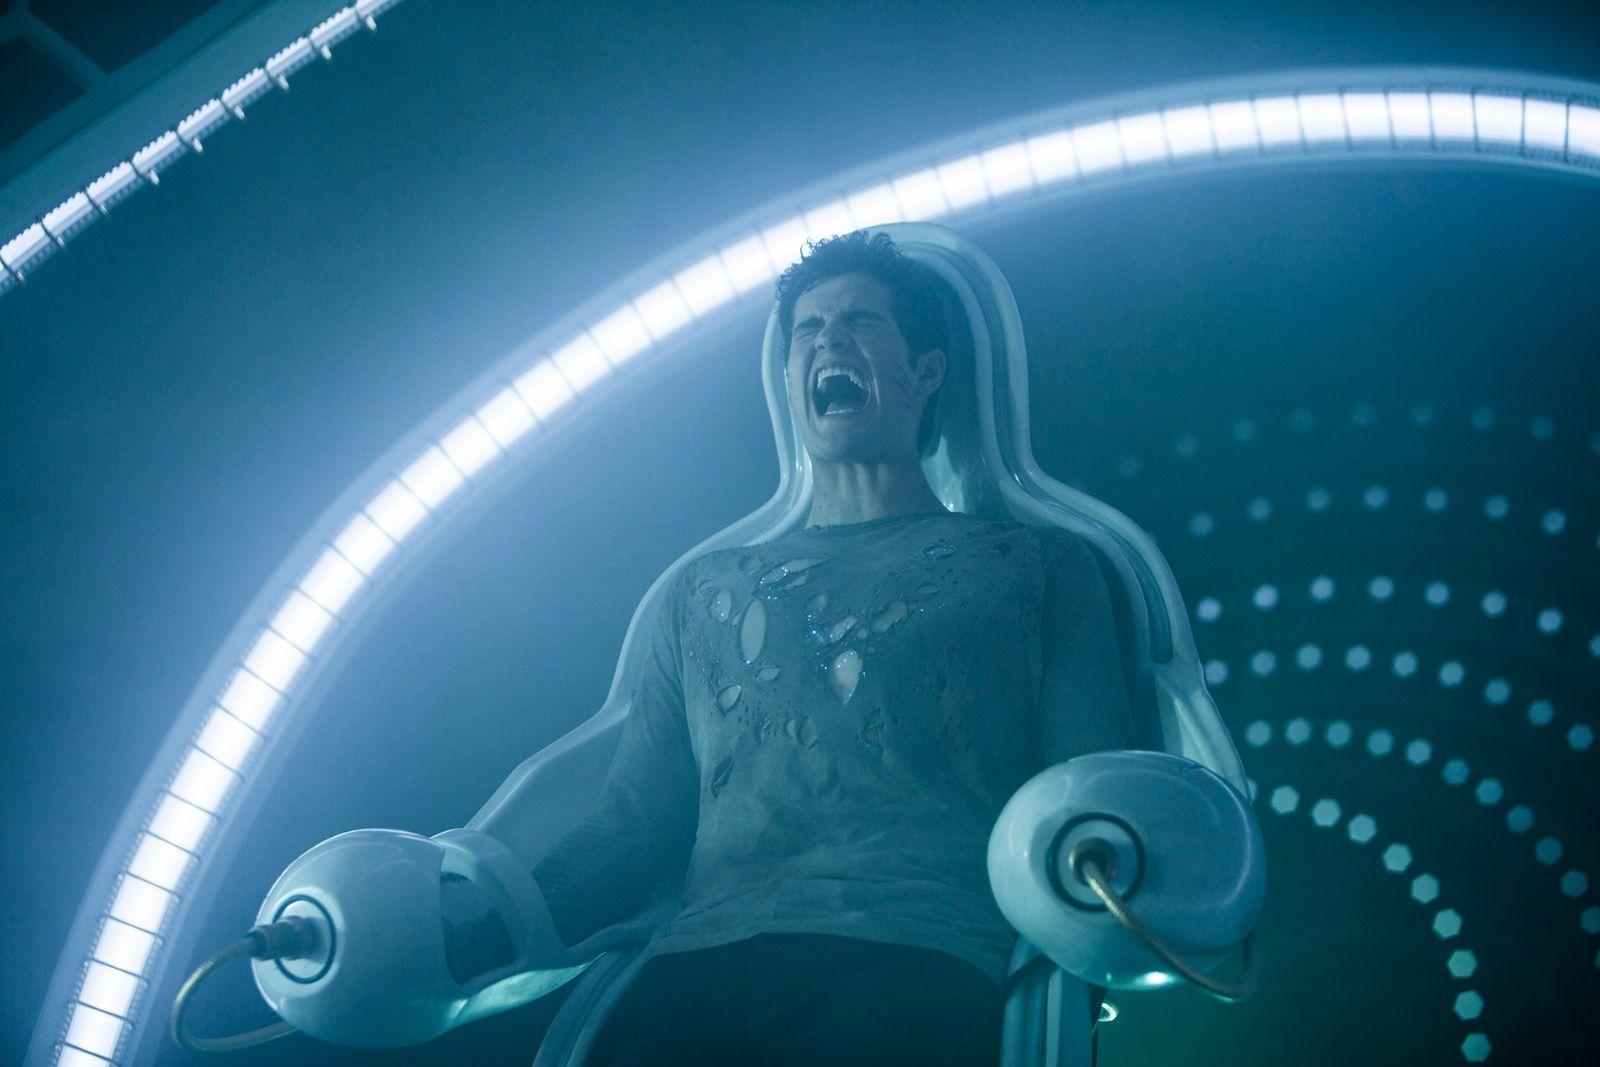 New IMAX trailer unleashed for 'Jack Reacher: Never Go Back'